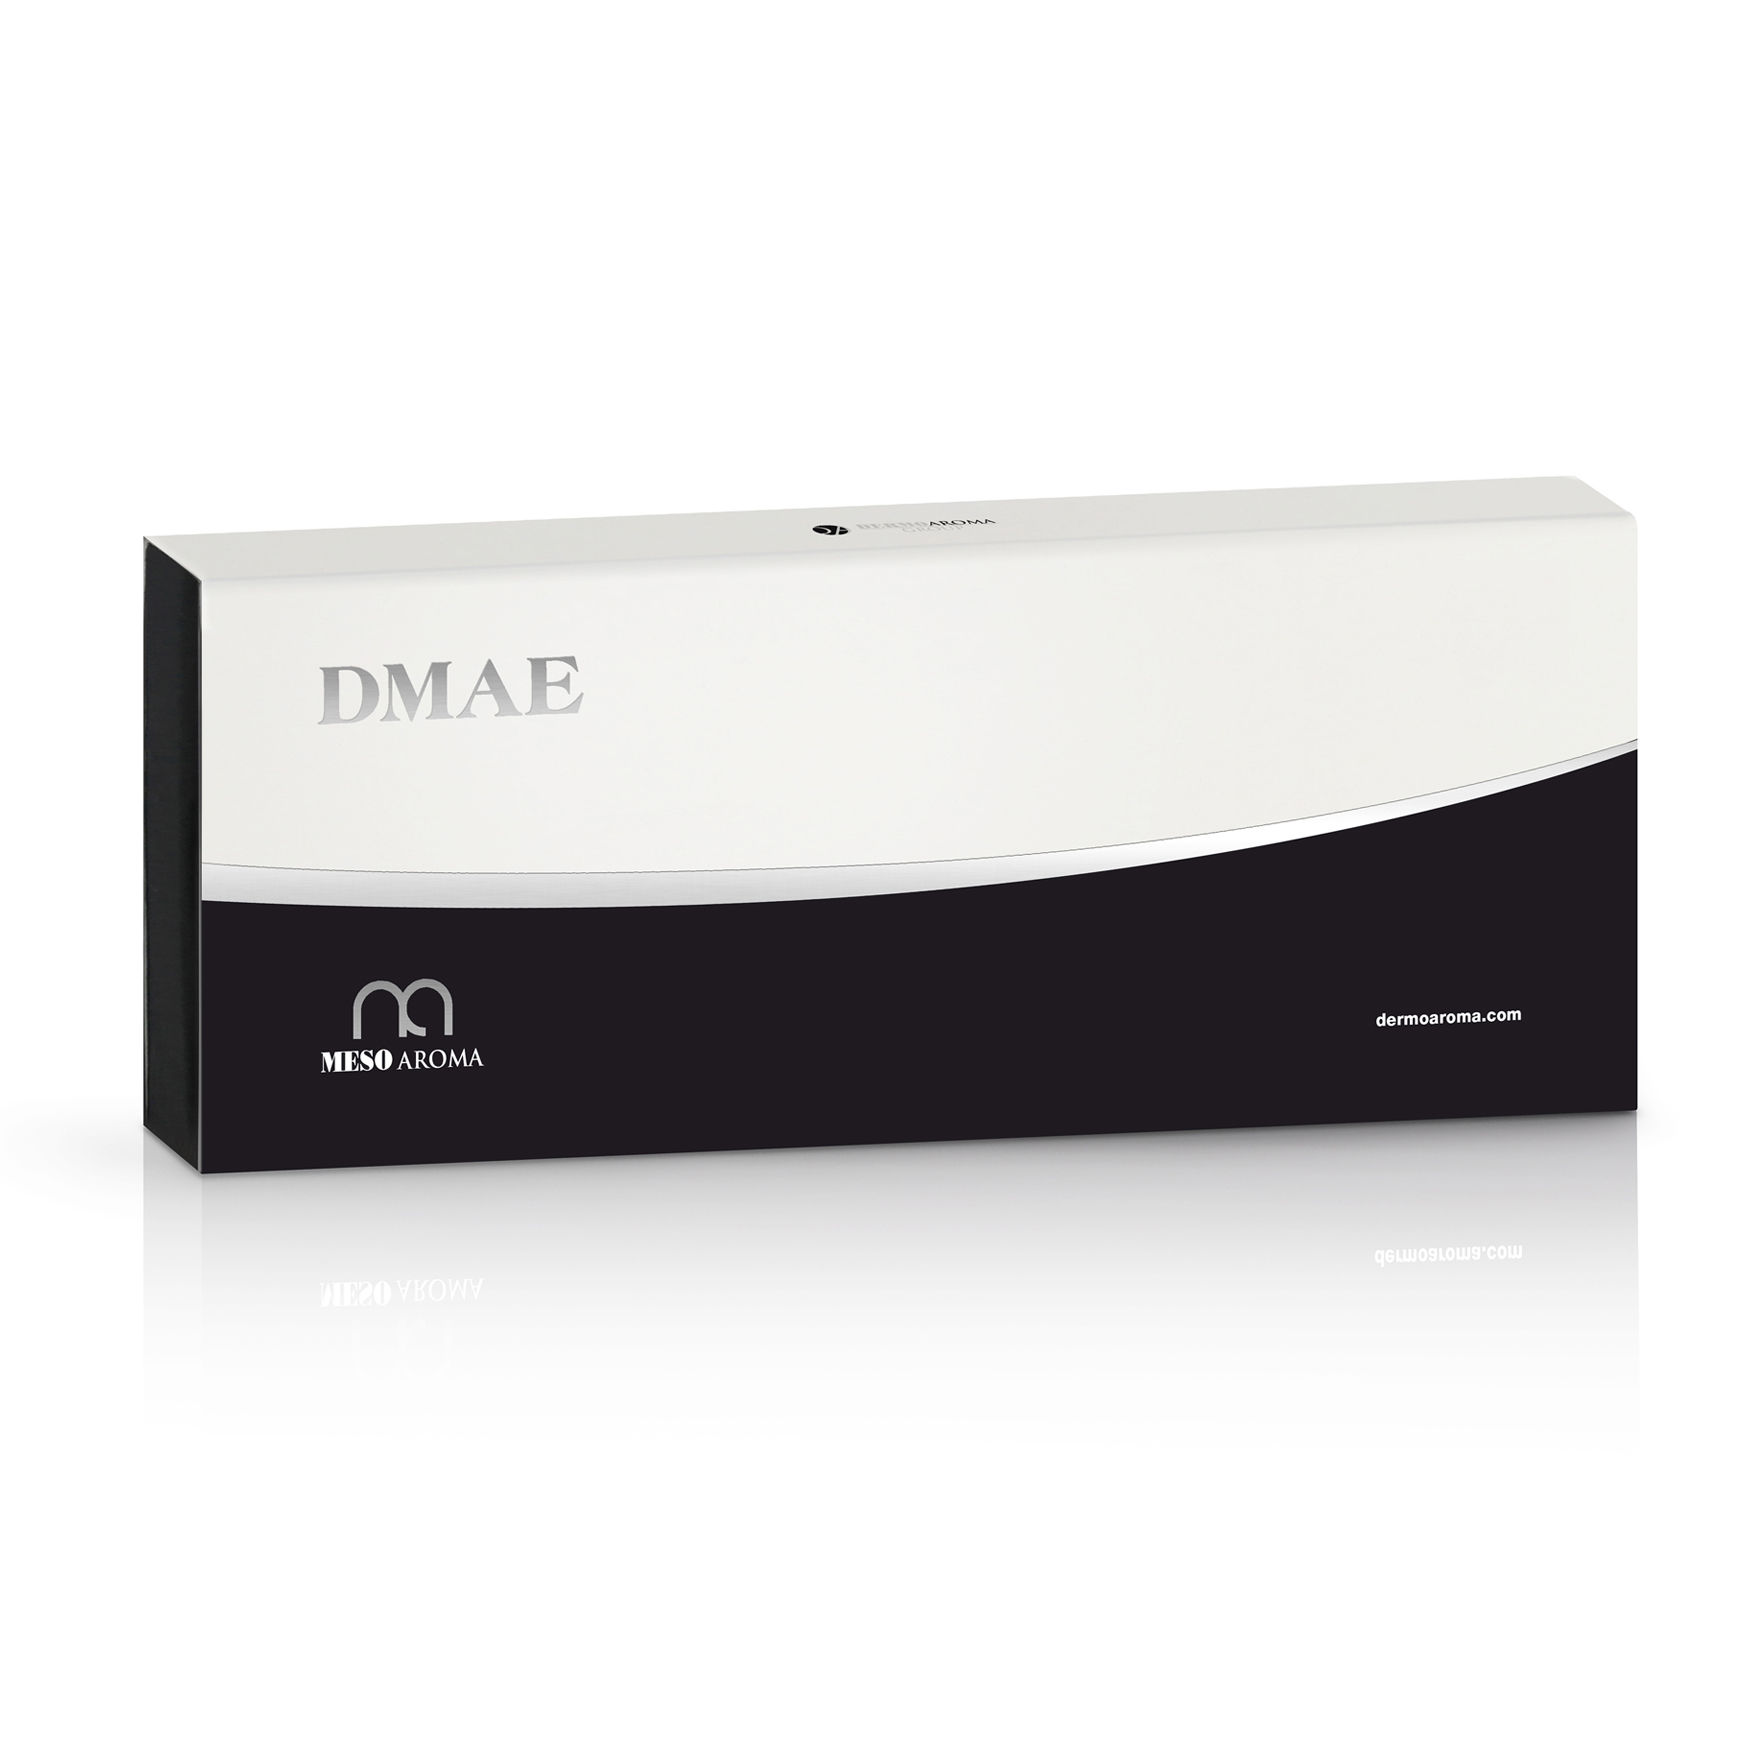 Mesoaroma-ampułki-do-mezoterapii-DMAE